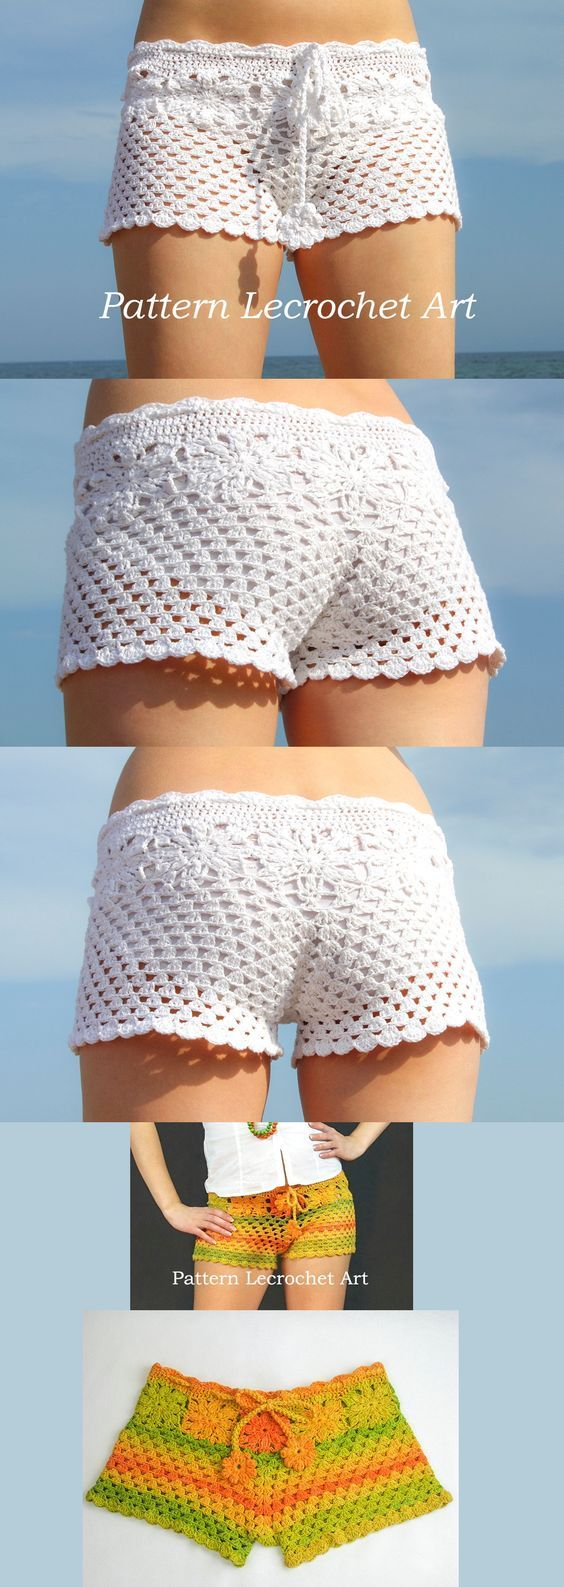 Crochet shorts: